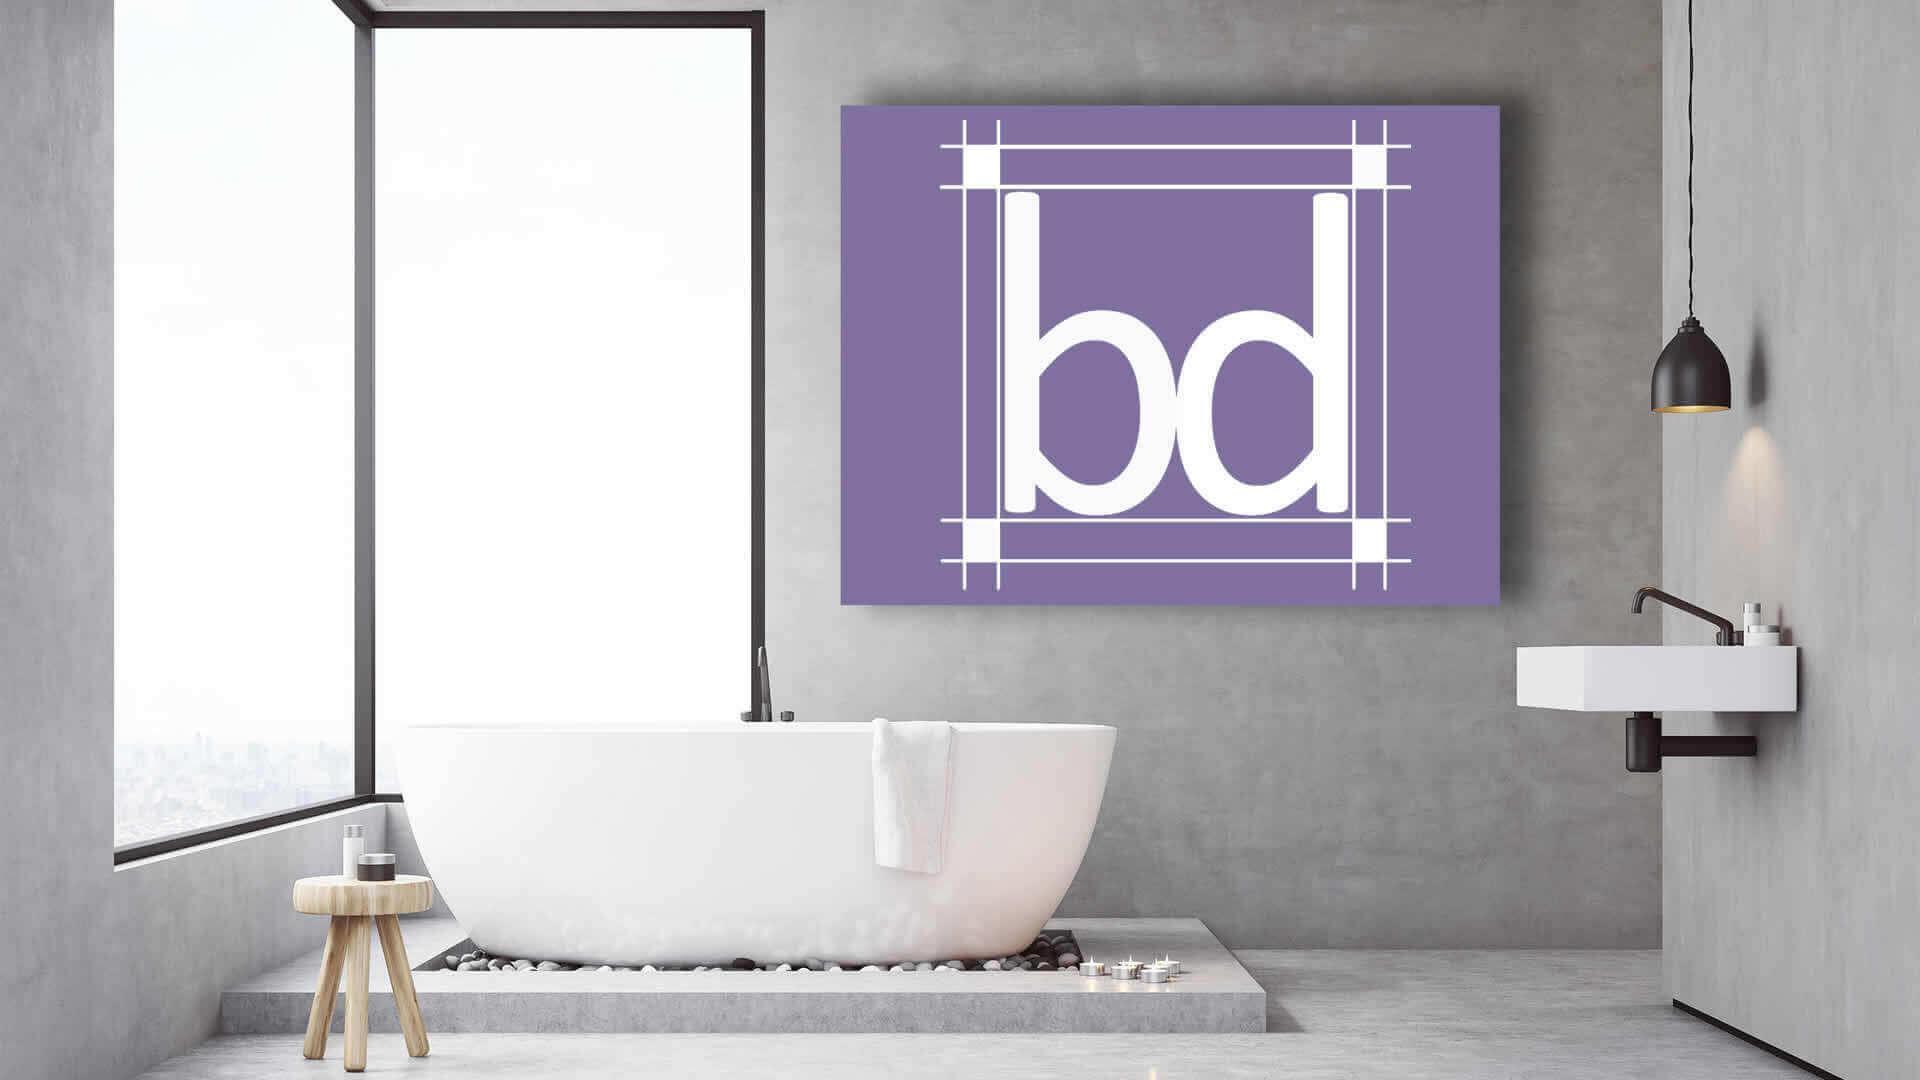 beton cire badkamer